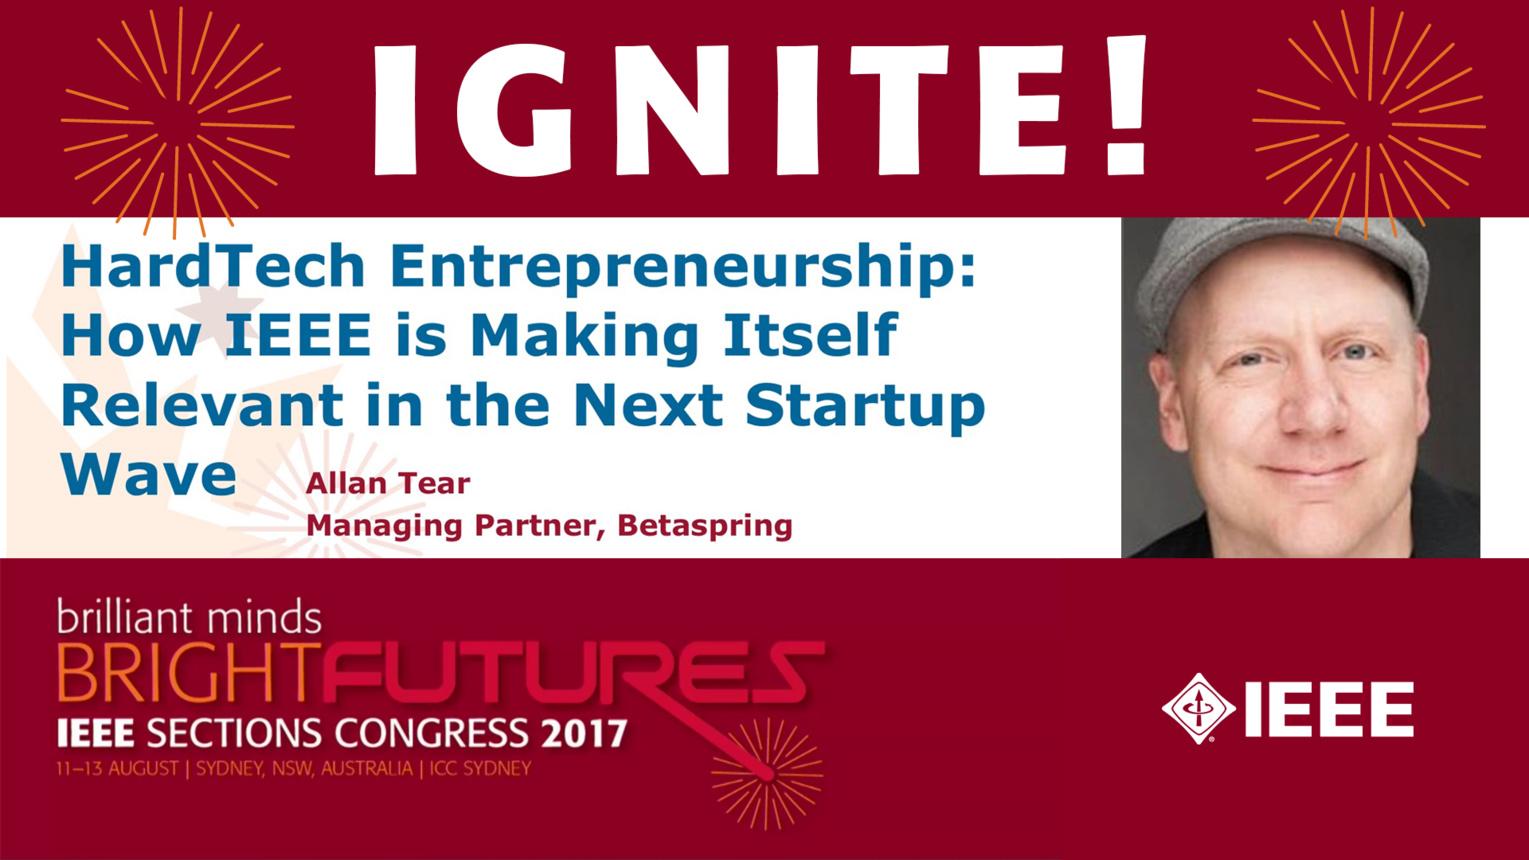 HardTech Entrepreneurship: IEEE in the Next Startup Wave - Allan Tear - Sections Congress 2017